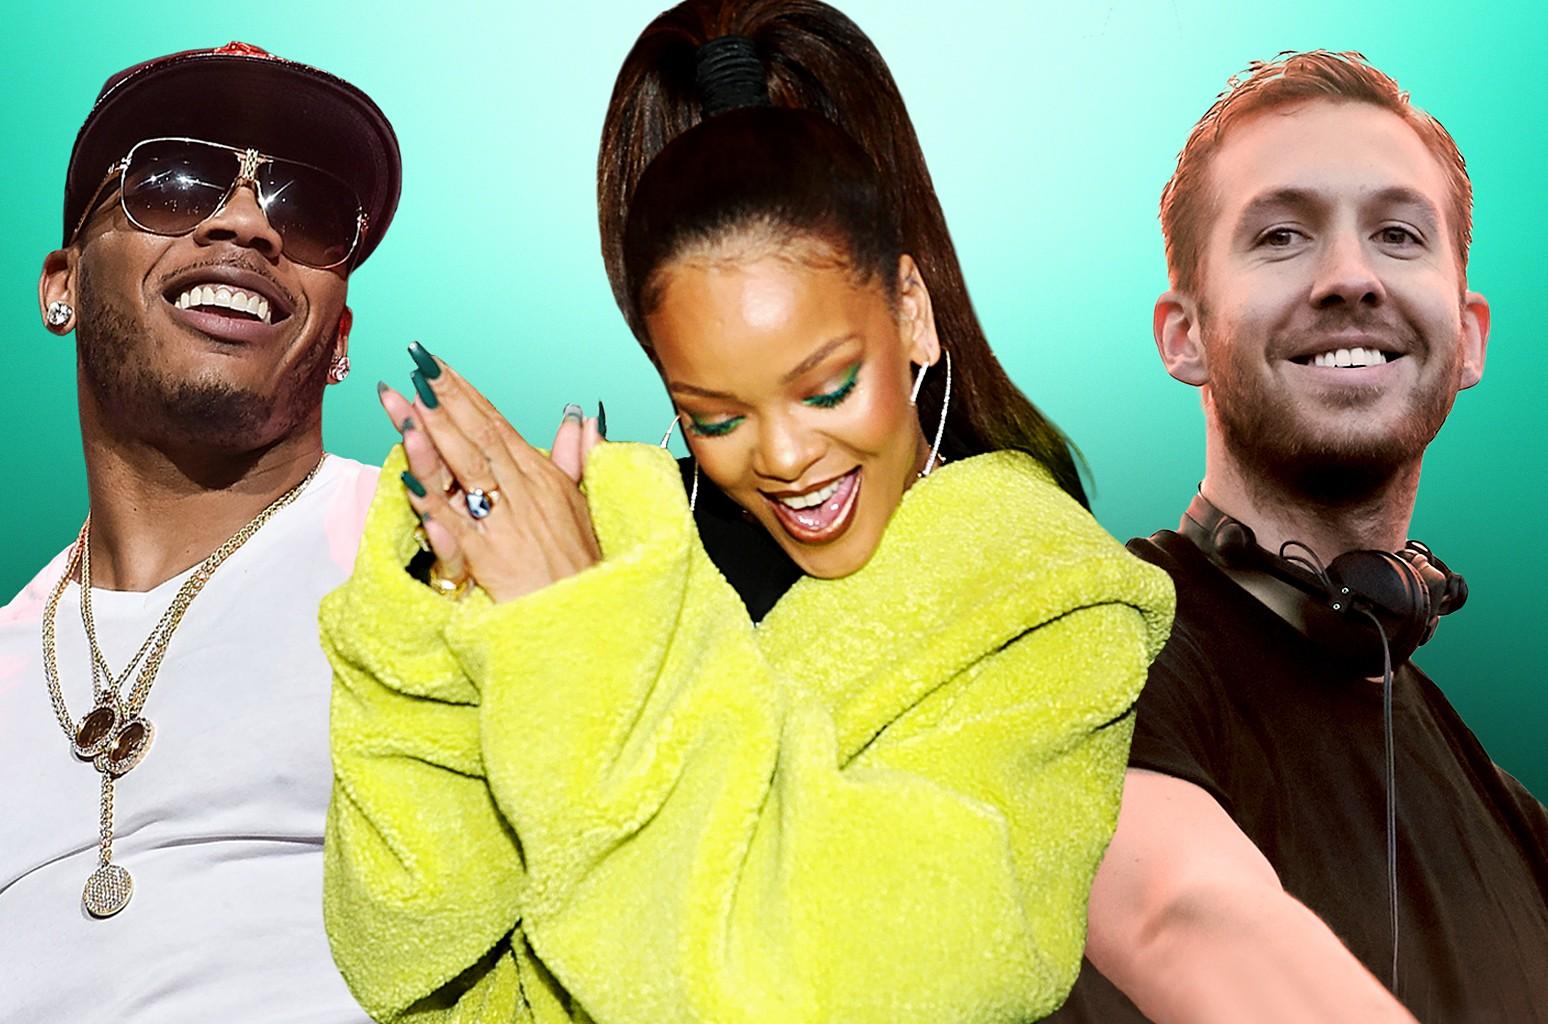 Top 50 Upbeat Feel Good Songs To Dance To Billboard